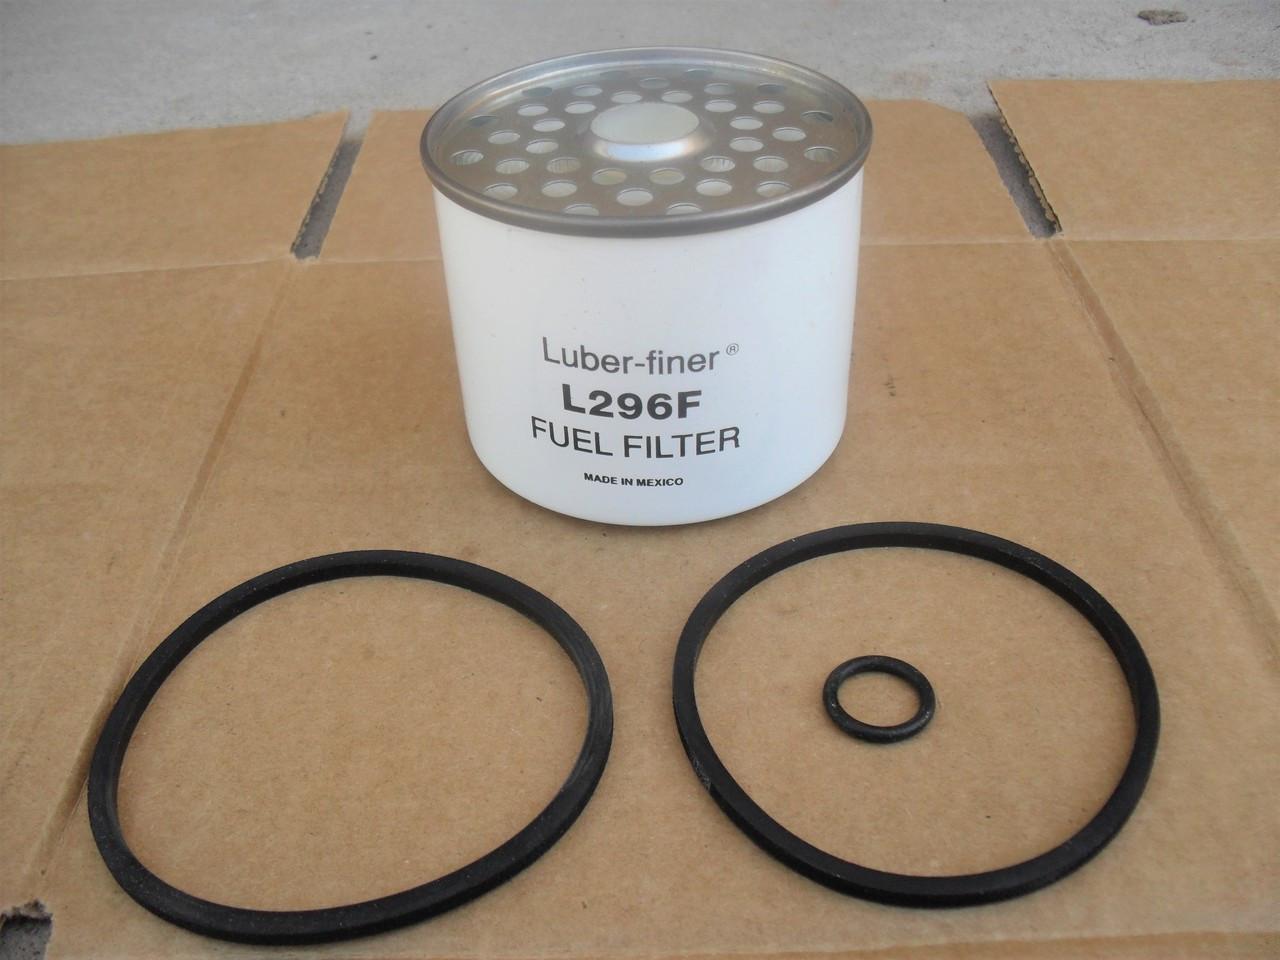 medium resolution of fuel filter for toro 335d 455 6500d reel master ground master 765220 76 5220 www lawnmowerpartstore com